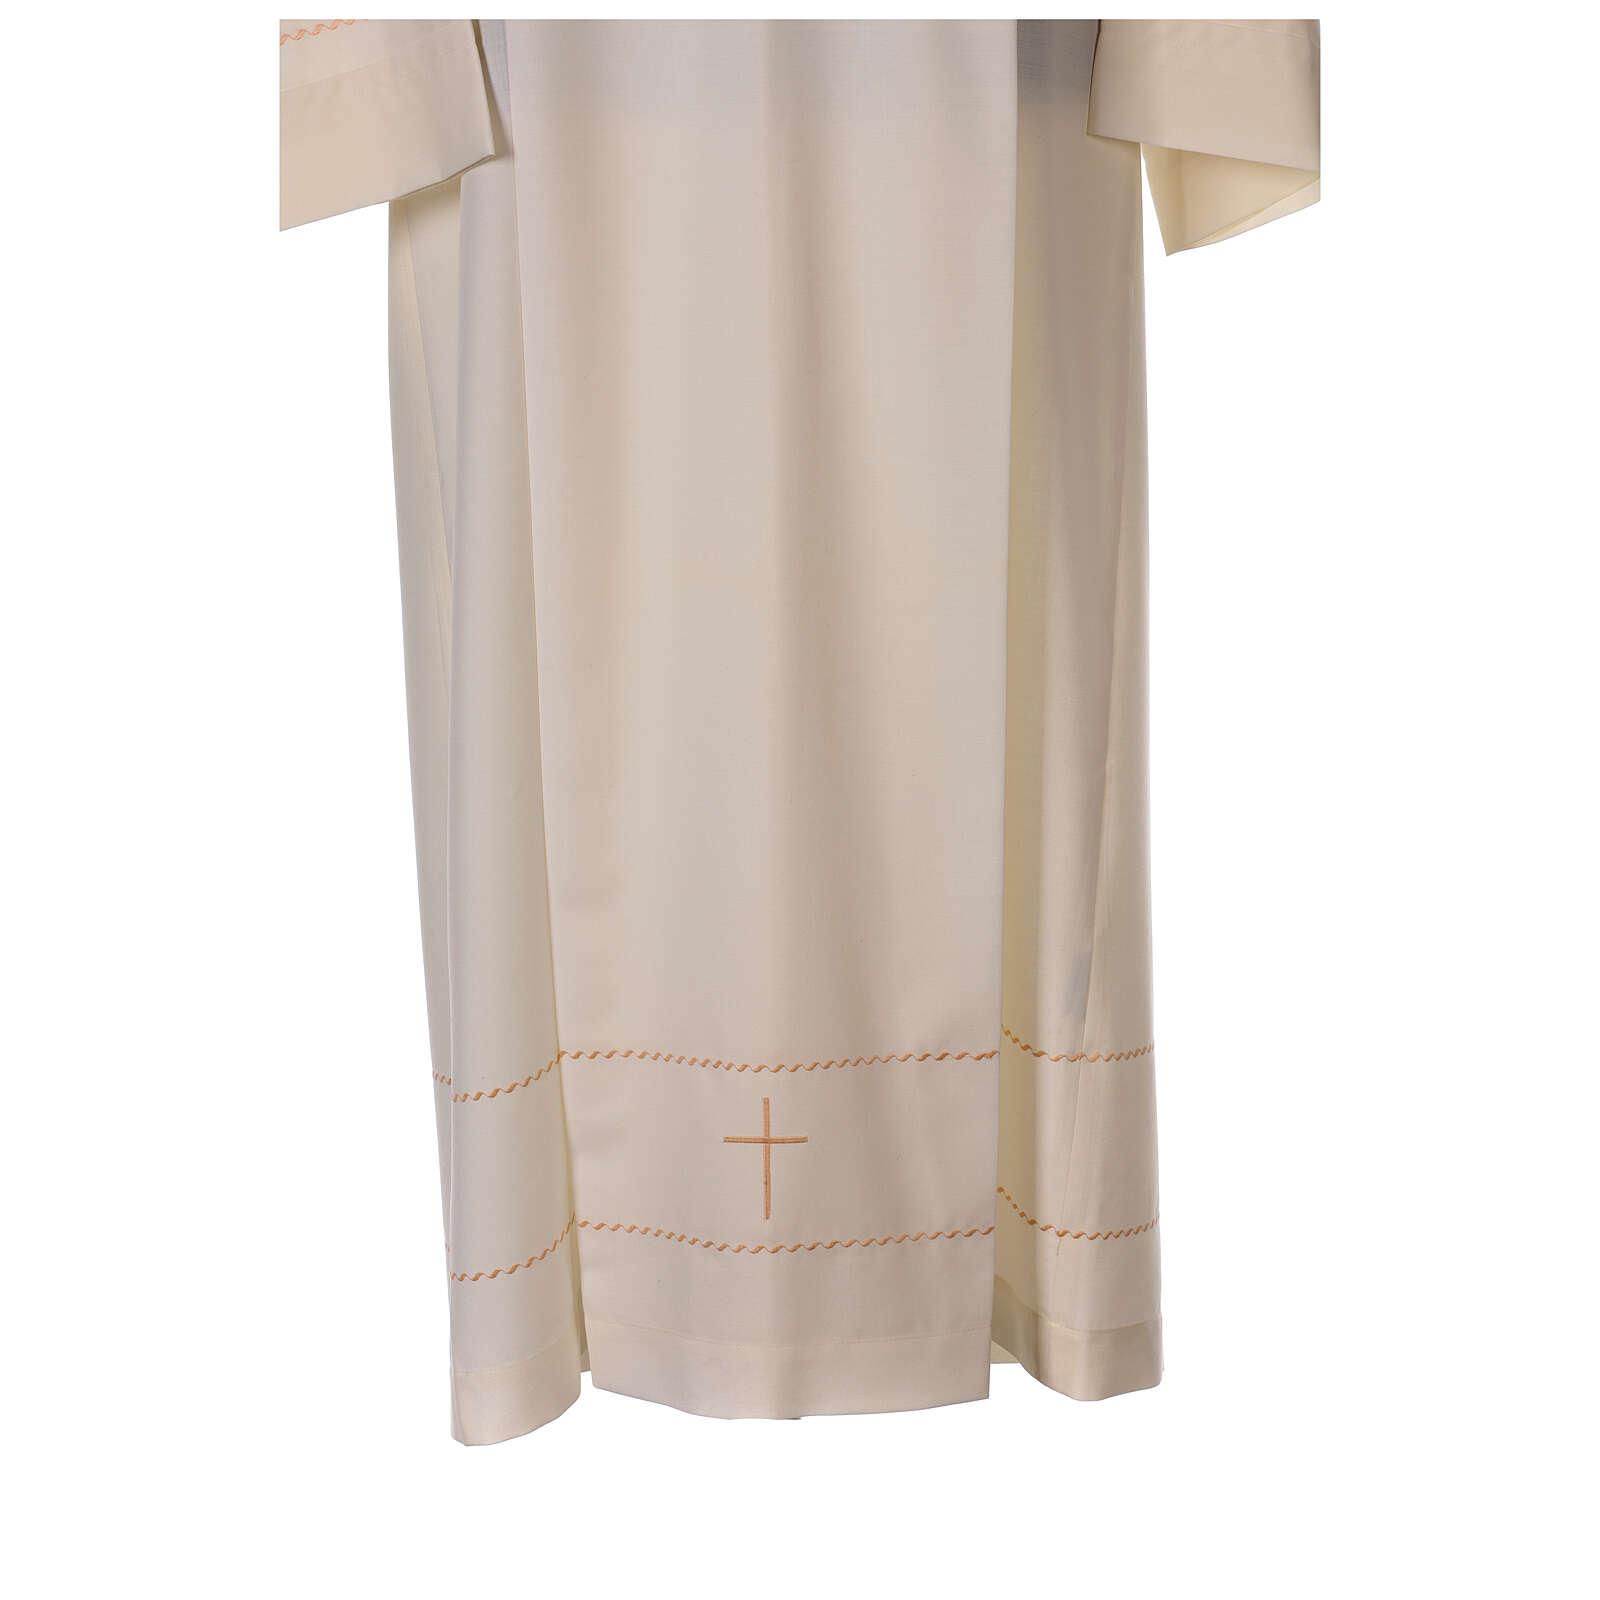 Alba marfil decoración dorada 55% lana 45% poliéster 4